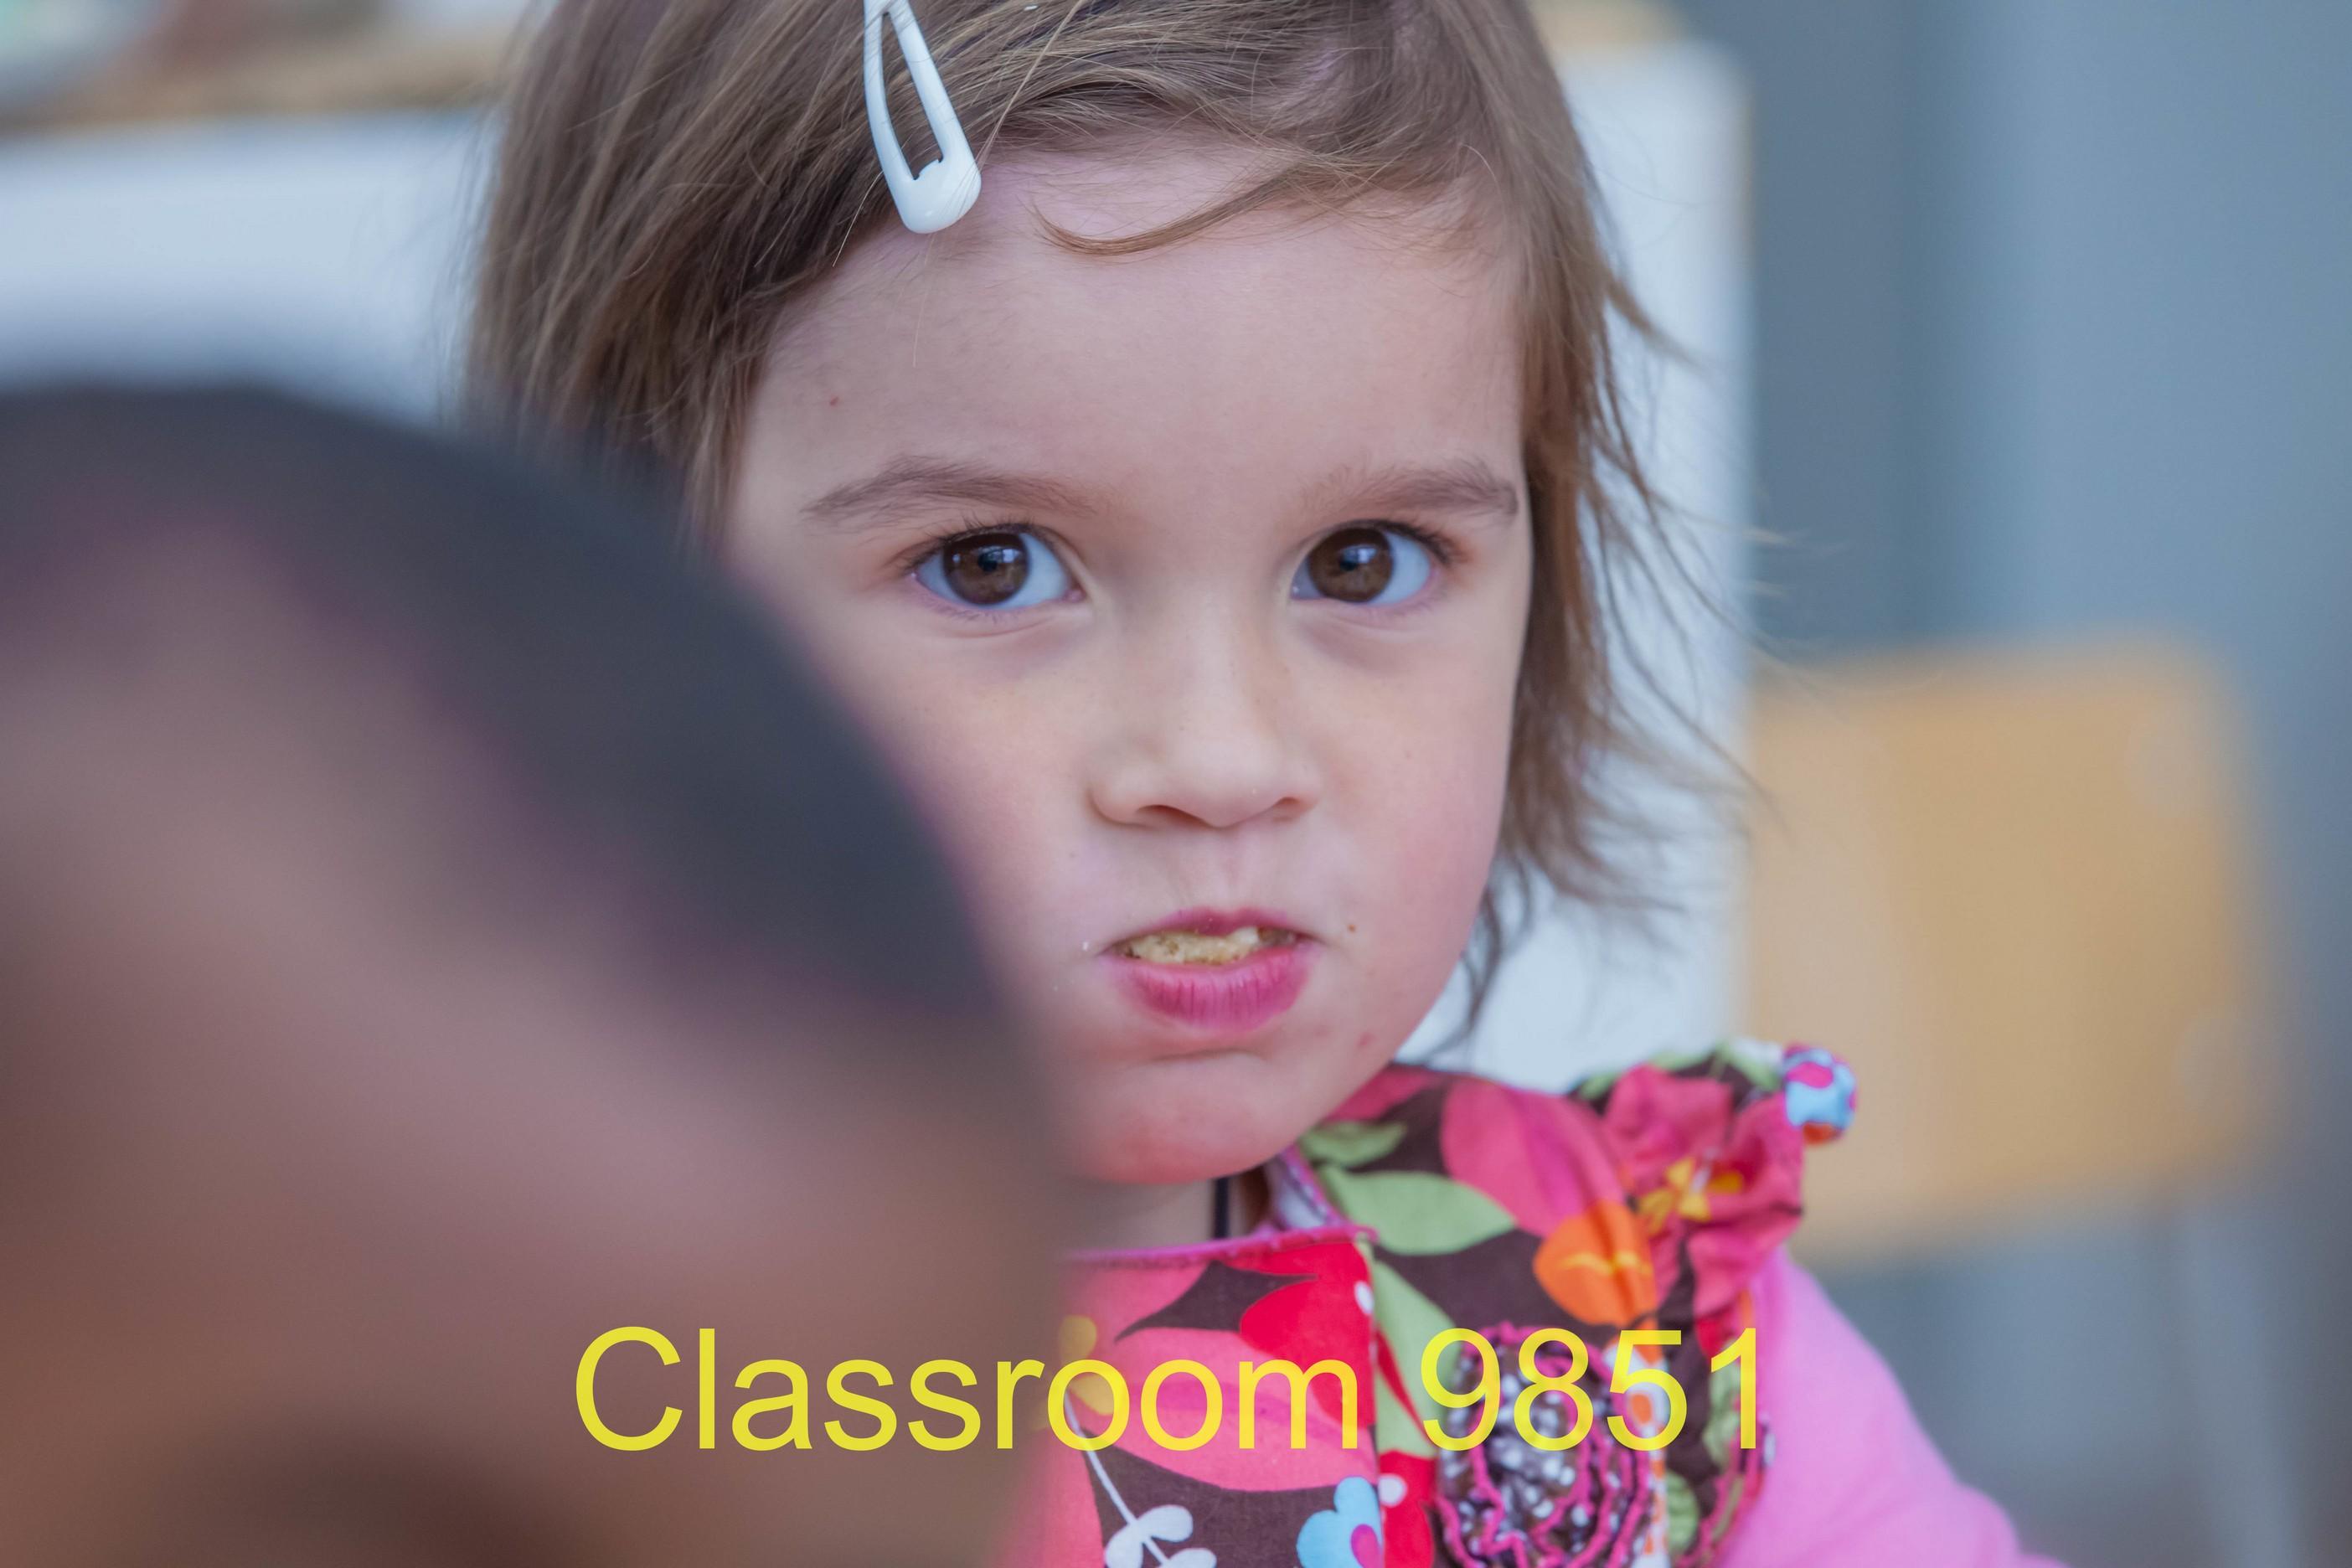 Classroom 9851